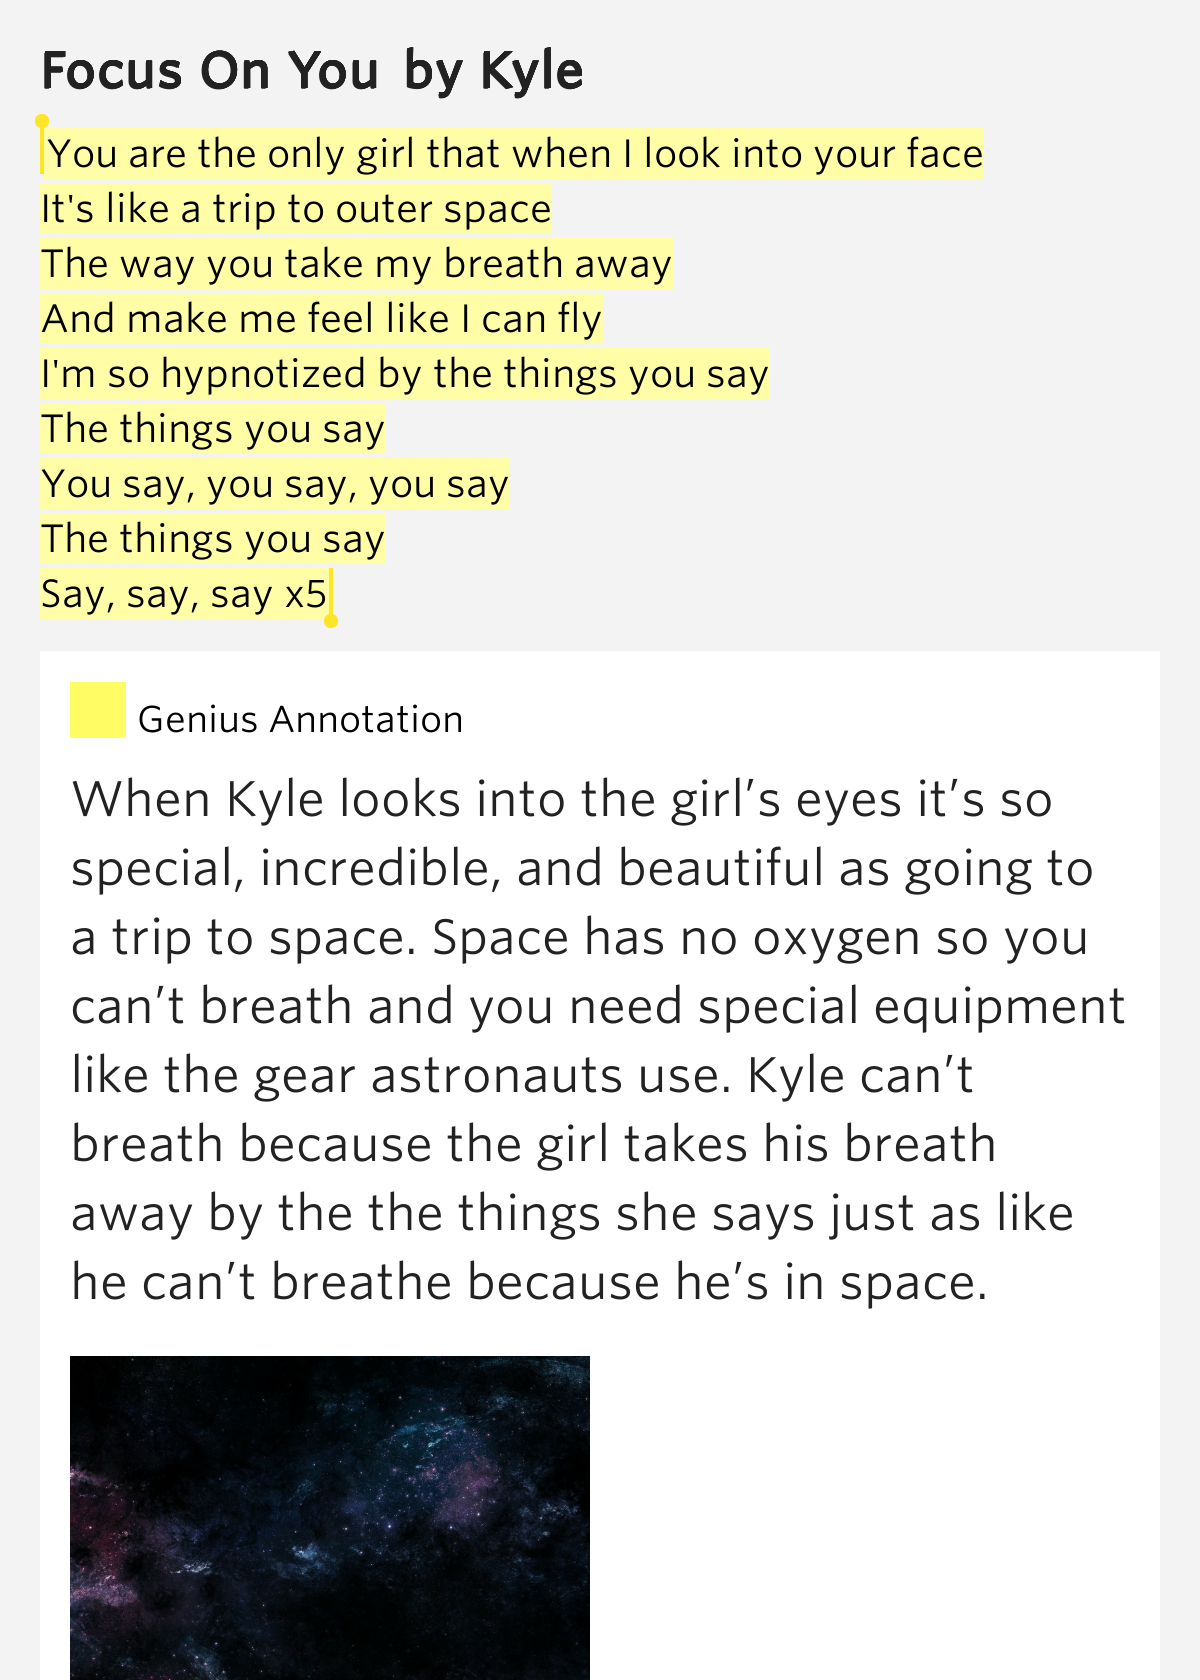 Say you me lyrics meaning